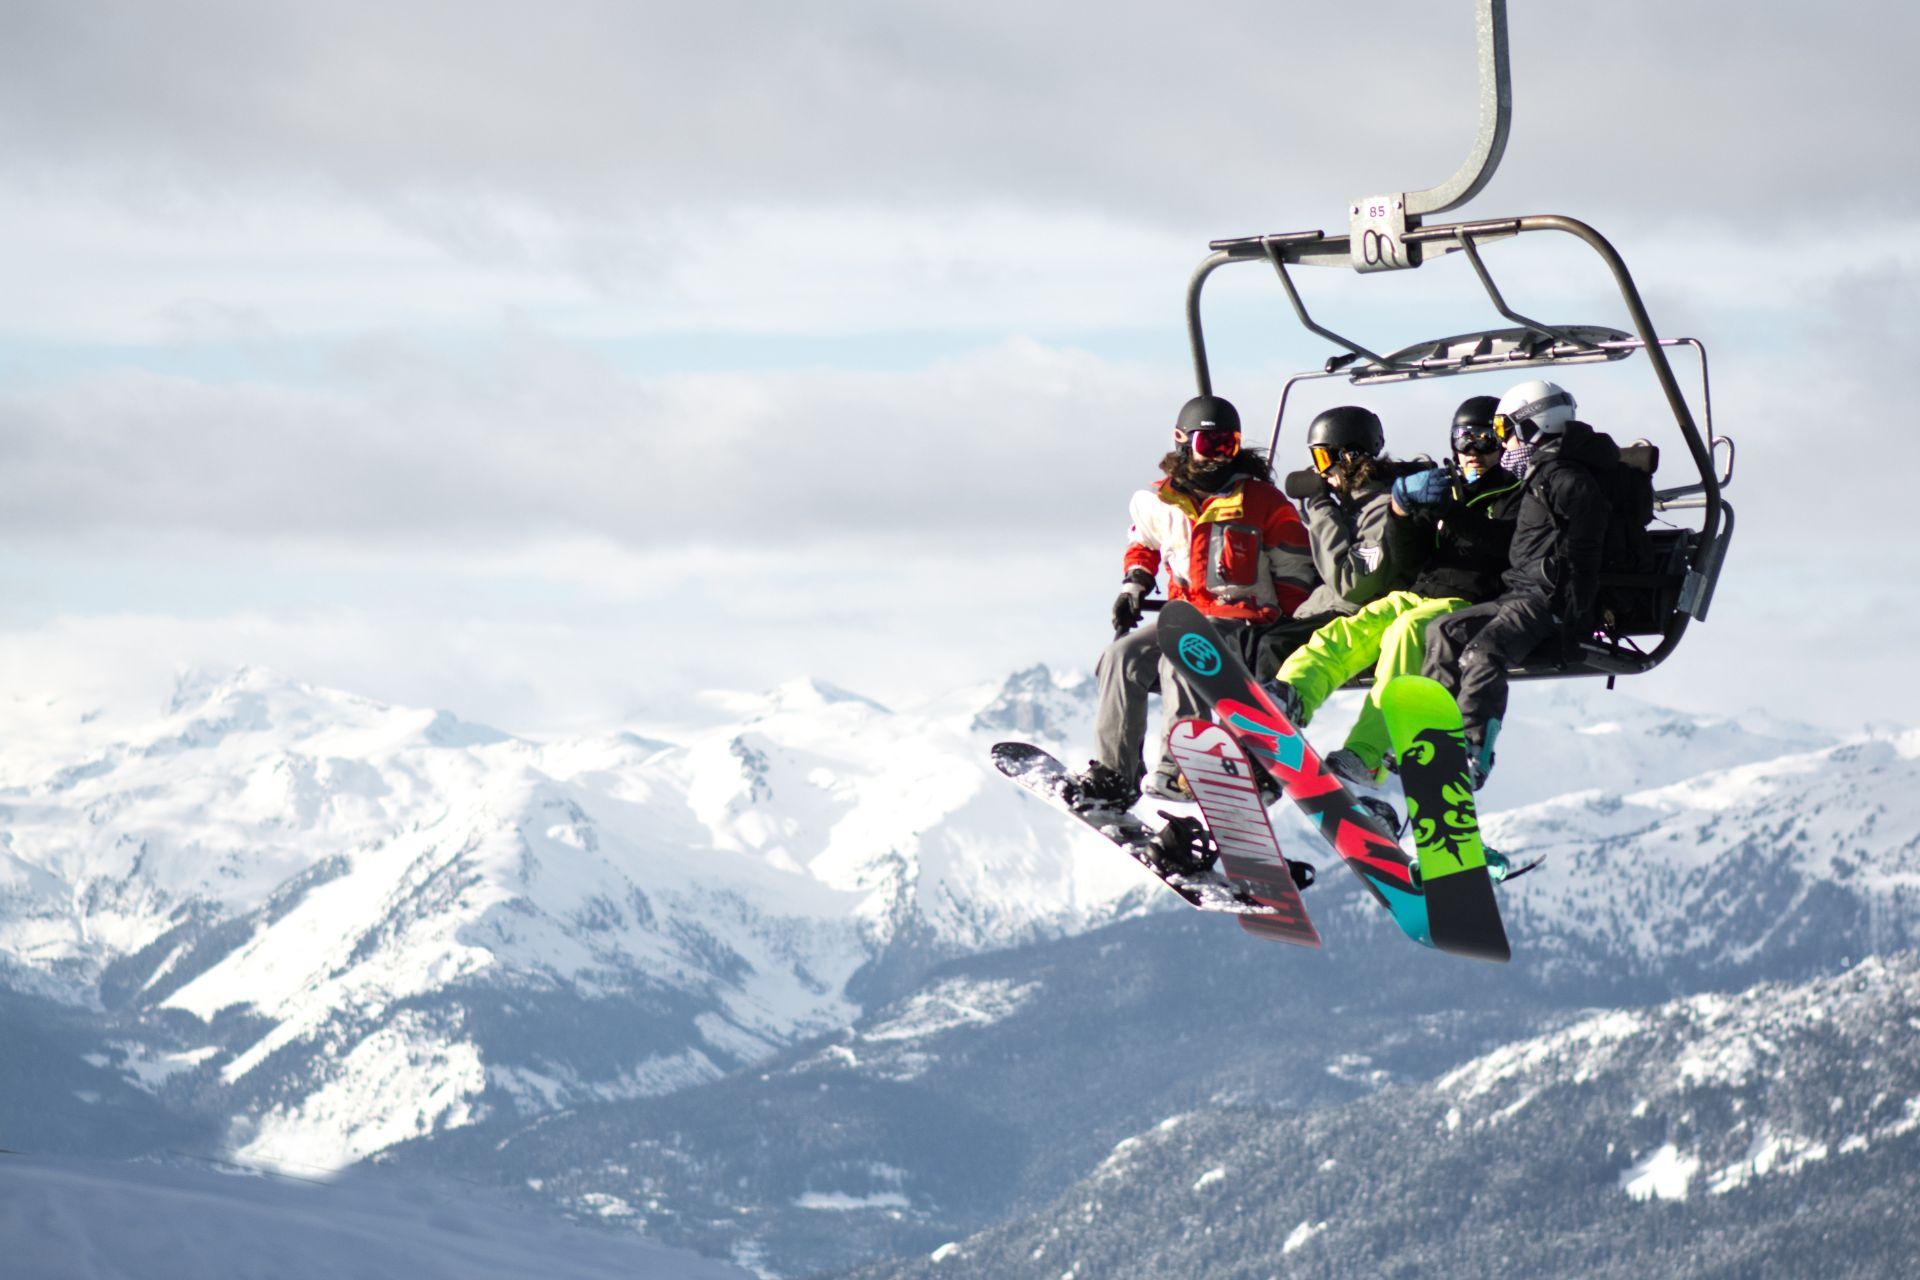 ski snowboard lift mountains.jpg